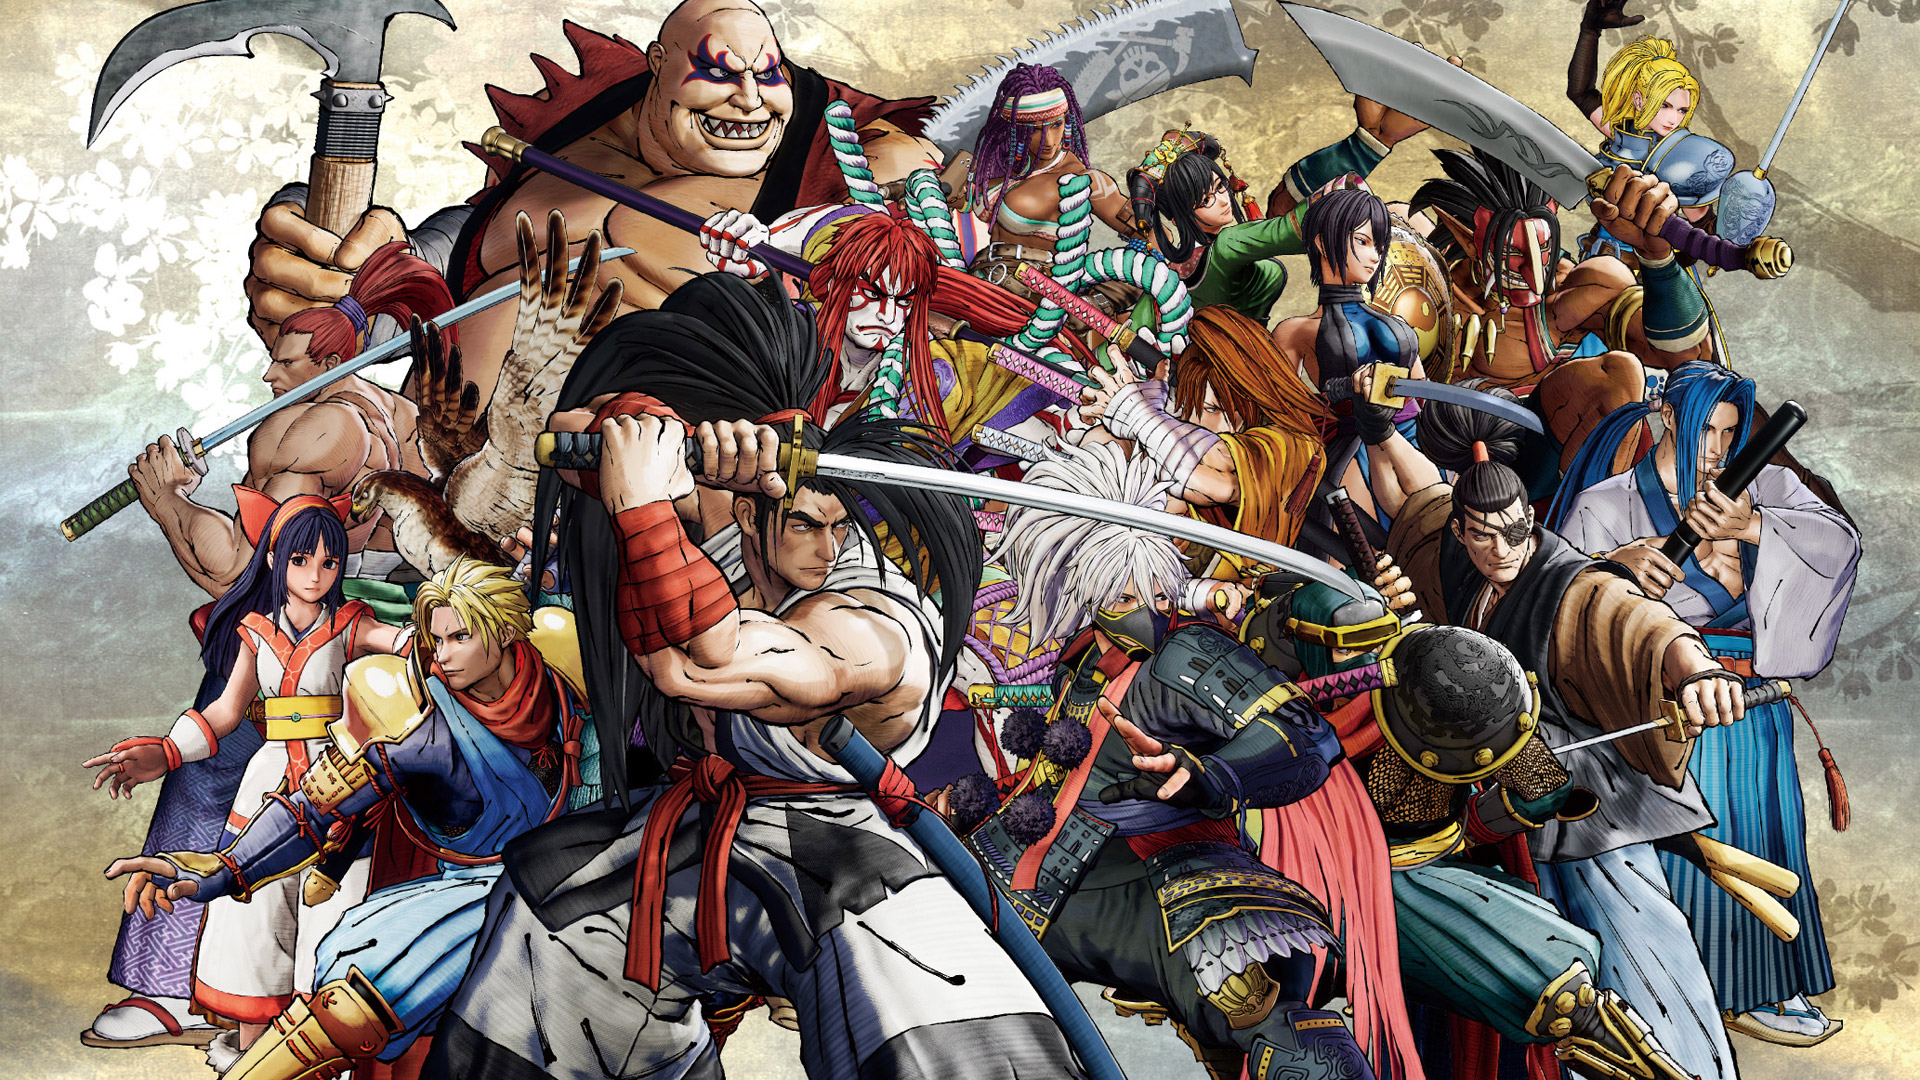 Free Samurai Shodown (2019) Wallpaper in 1920x1080